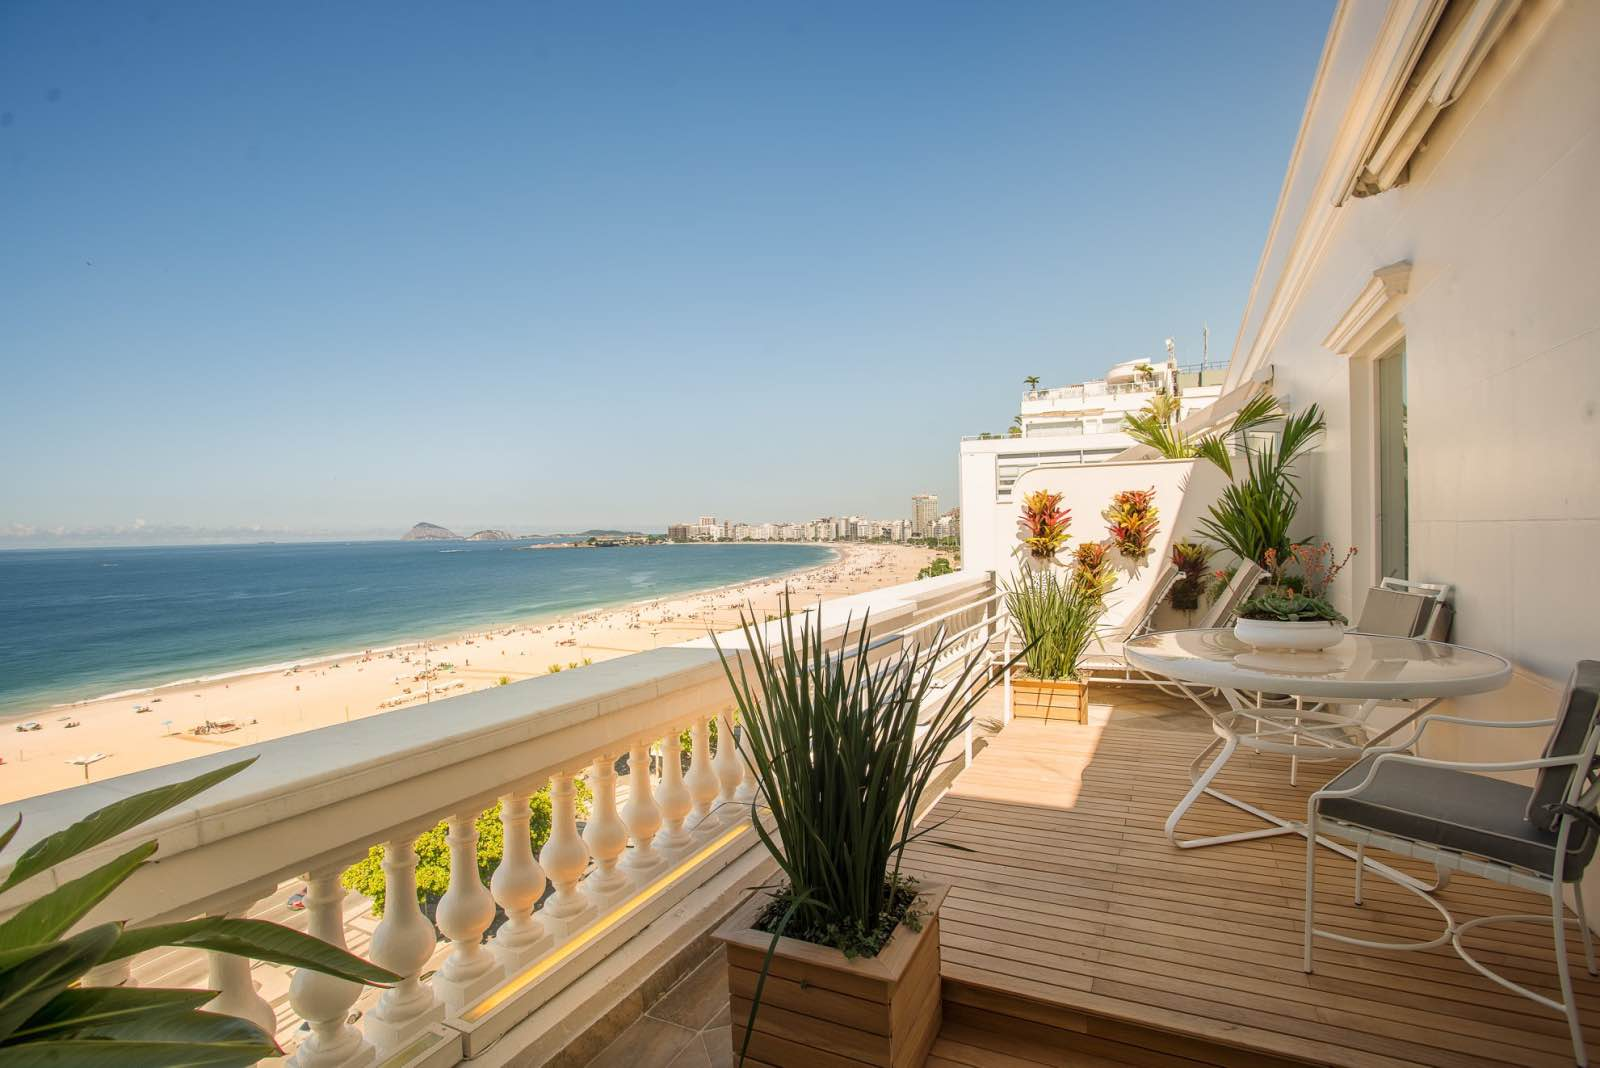 Belmond Copacabana Palace view of ocean